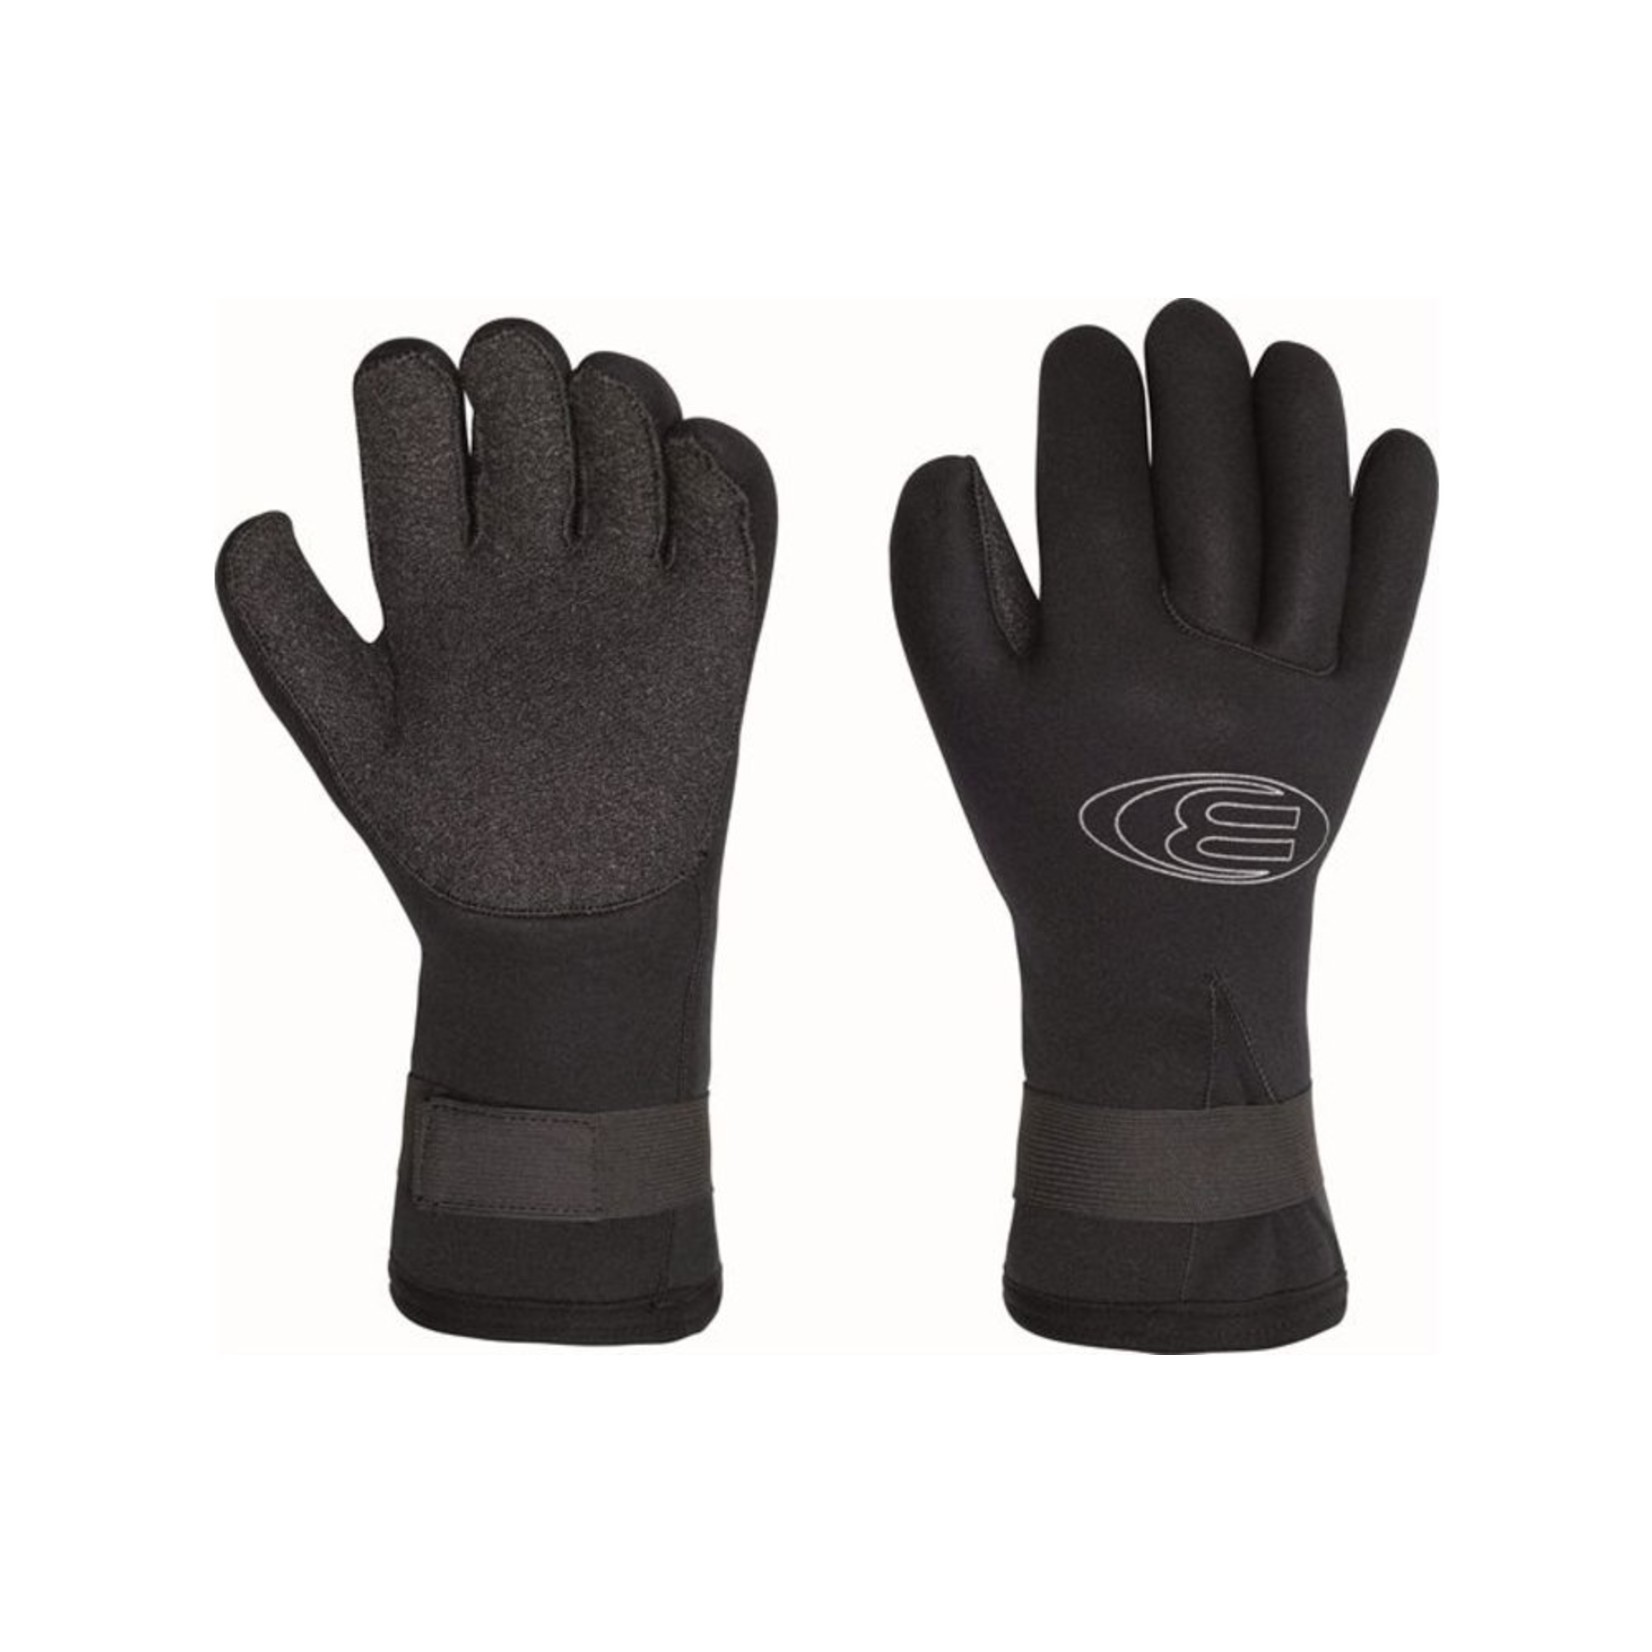 Bare 5mm Coldwater Handschoenen Kevlar Palm